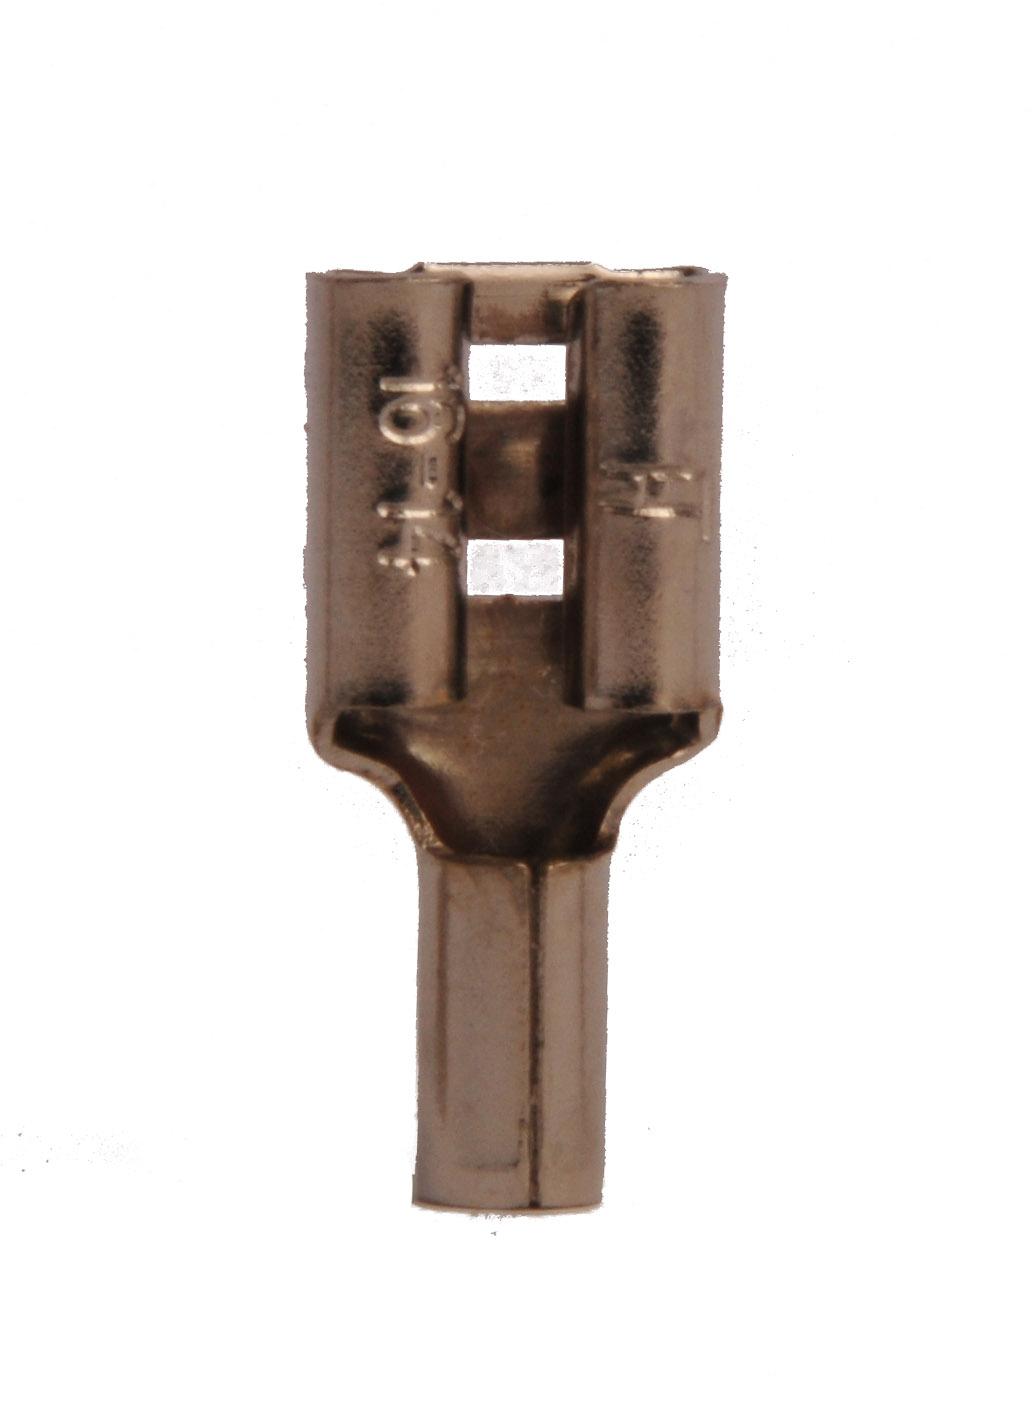 16-14 Non Insulated .250 FQC - Steel